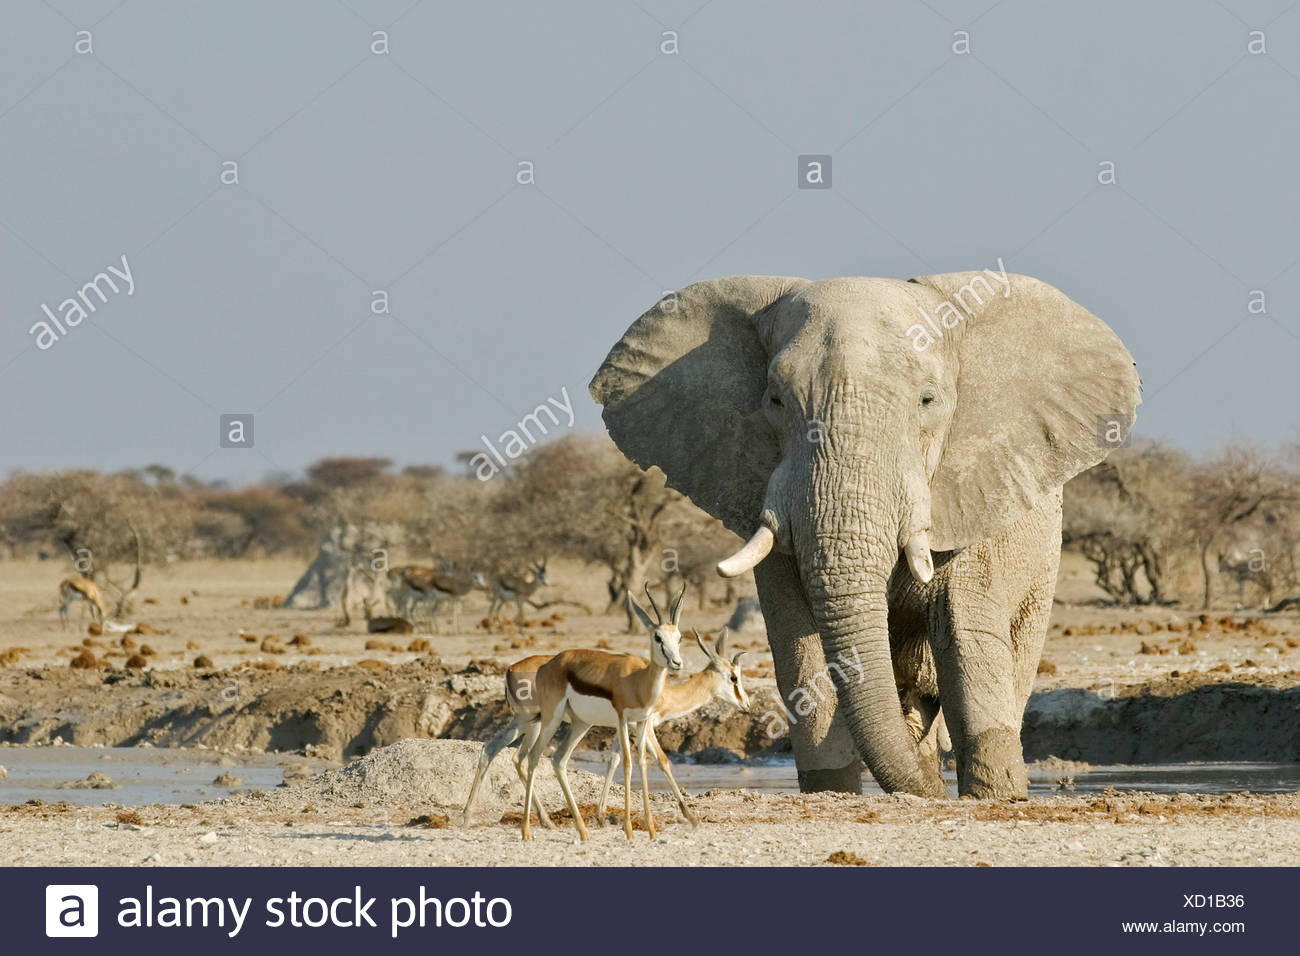 African Elephant (Loxodonta africana) and springboks (Antidorcas marsupialis), Nxai Pan, Makgadikgadi Pans National Park, Botsw Stock Photo